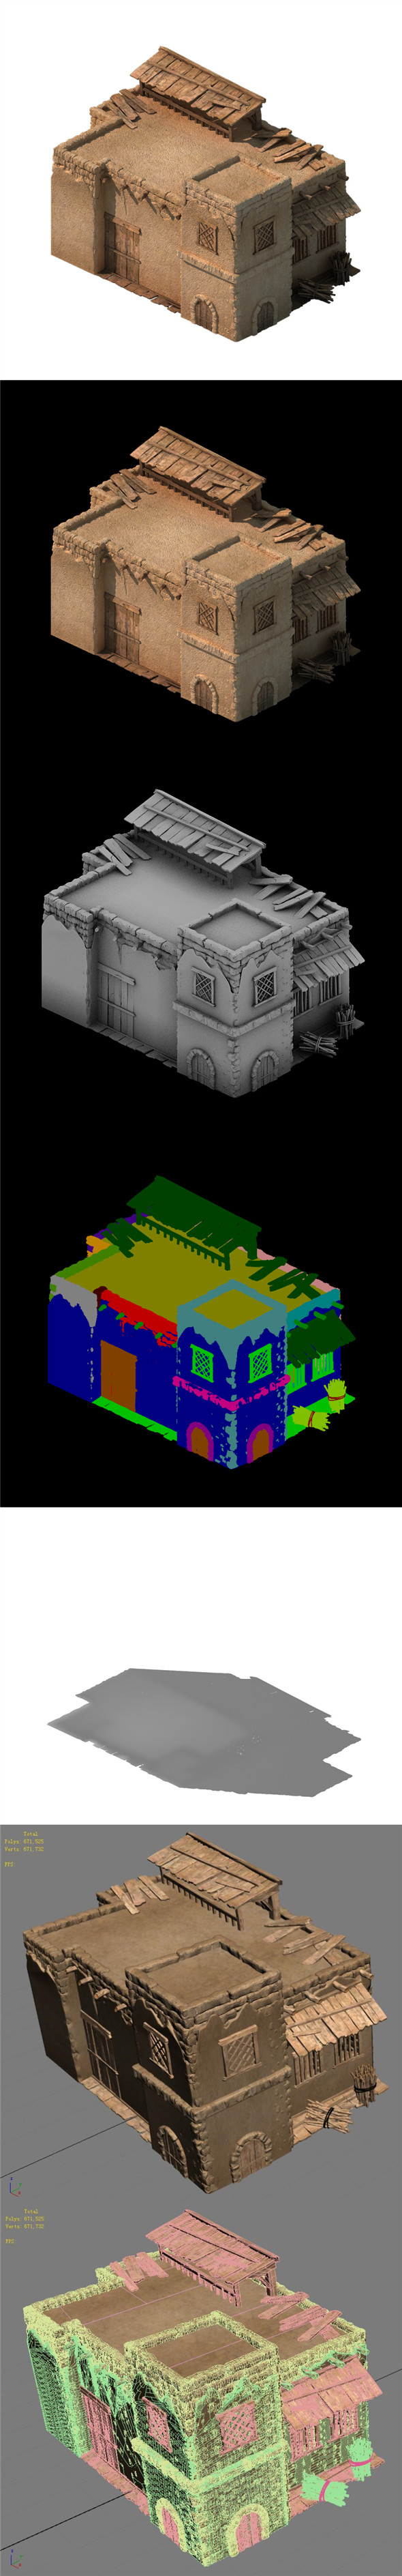 Desert Ancient Battlefield - House 02 - 3DOcean Item for Sale